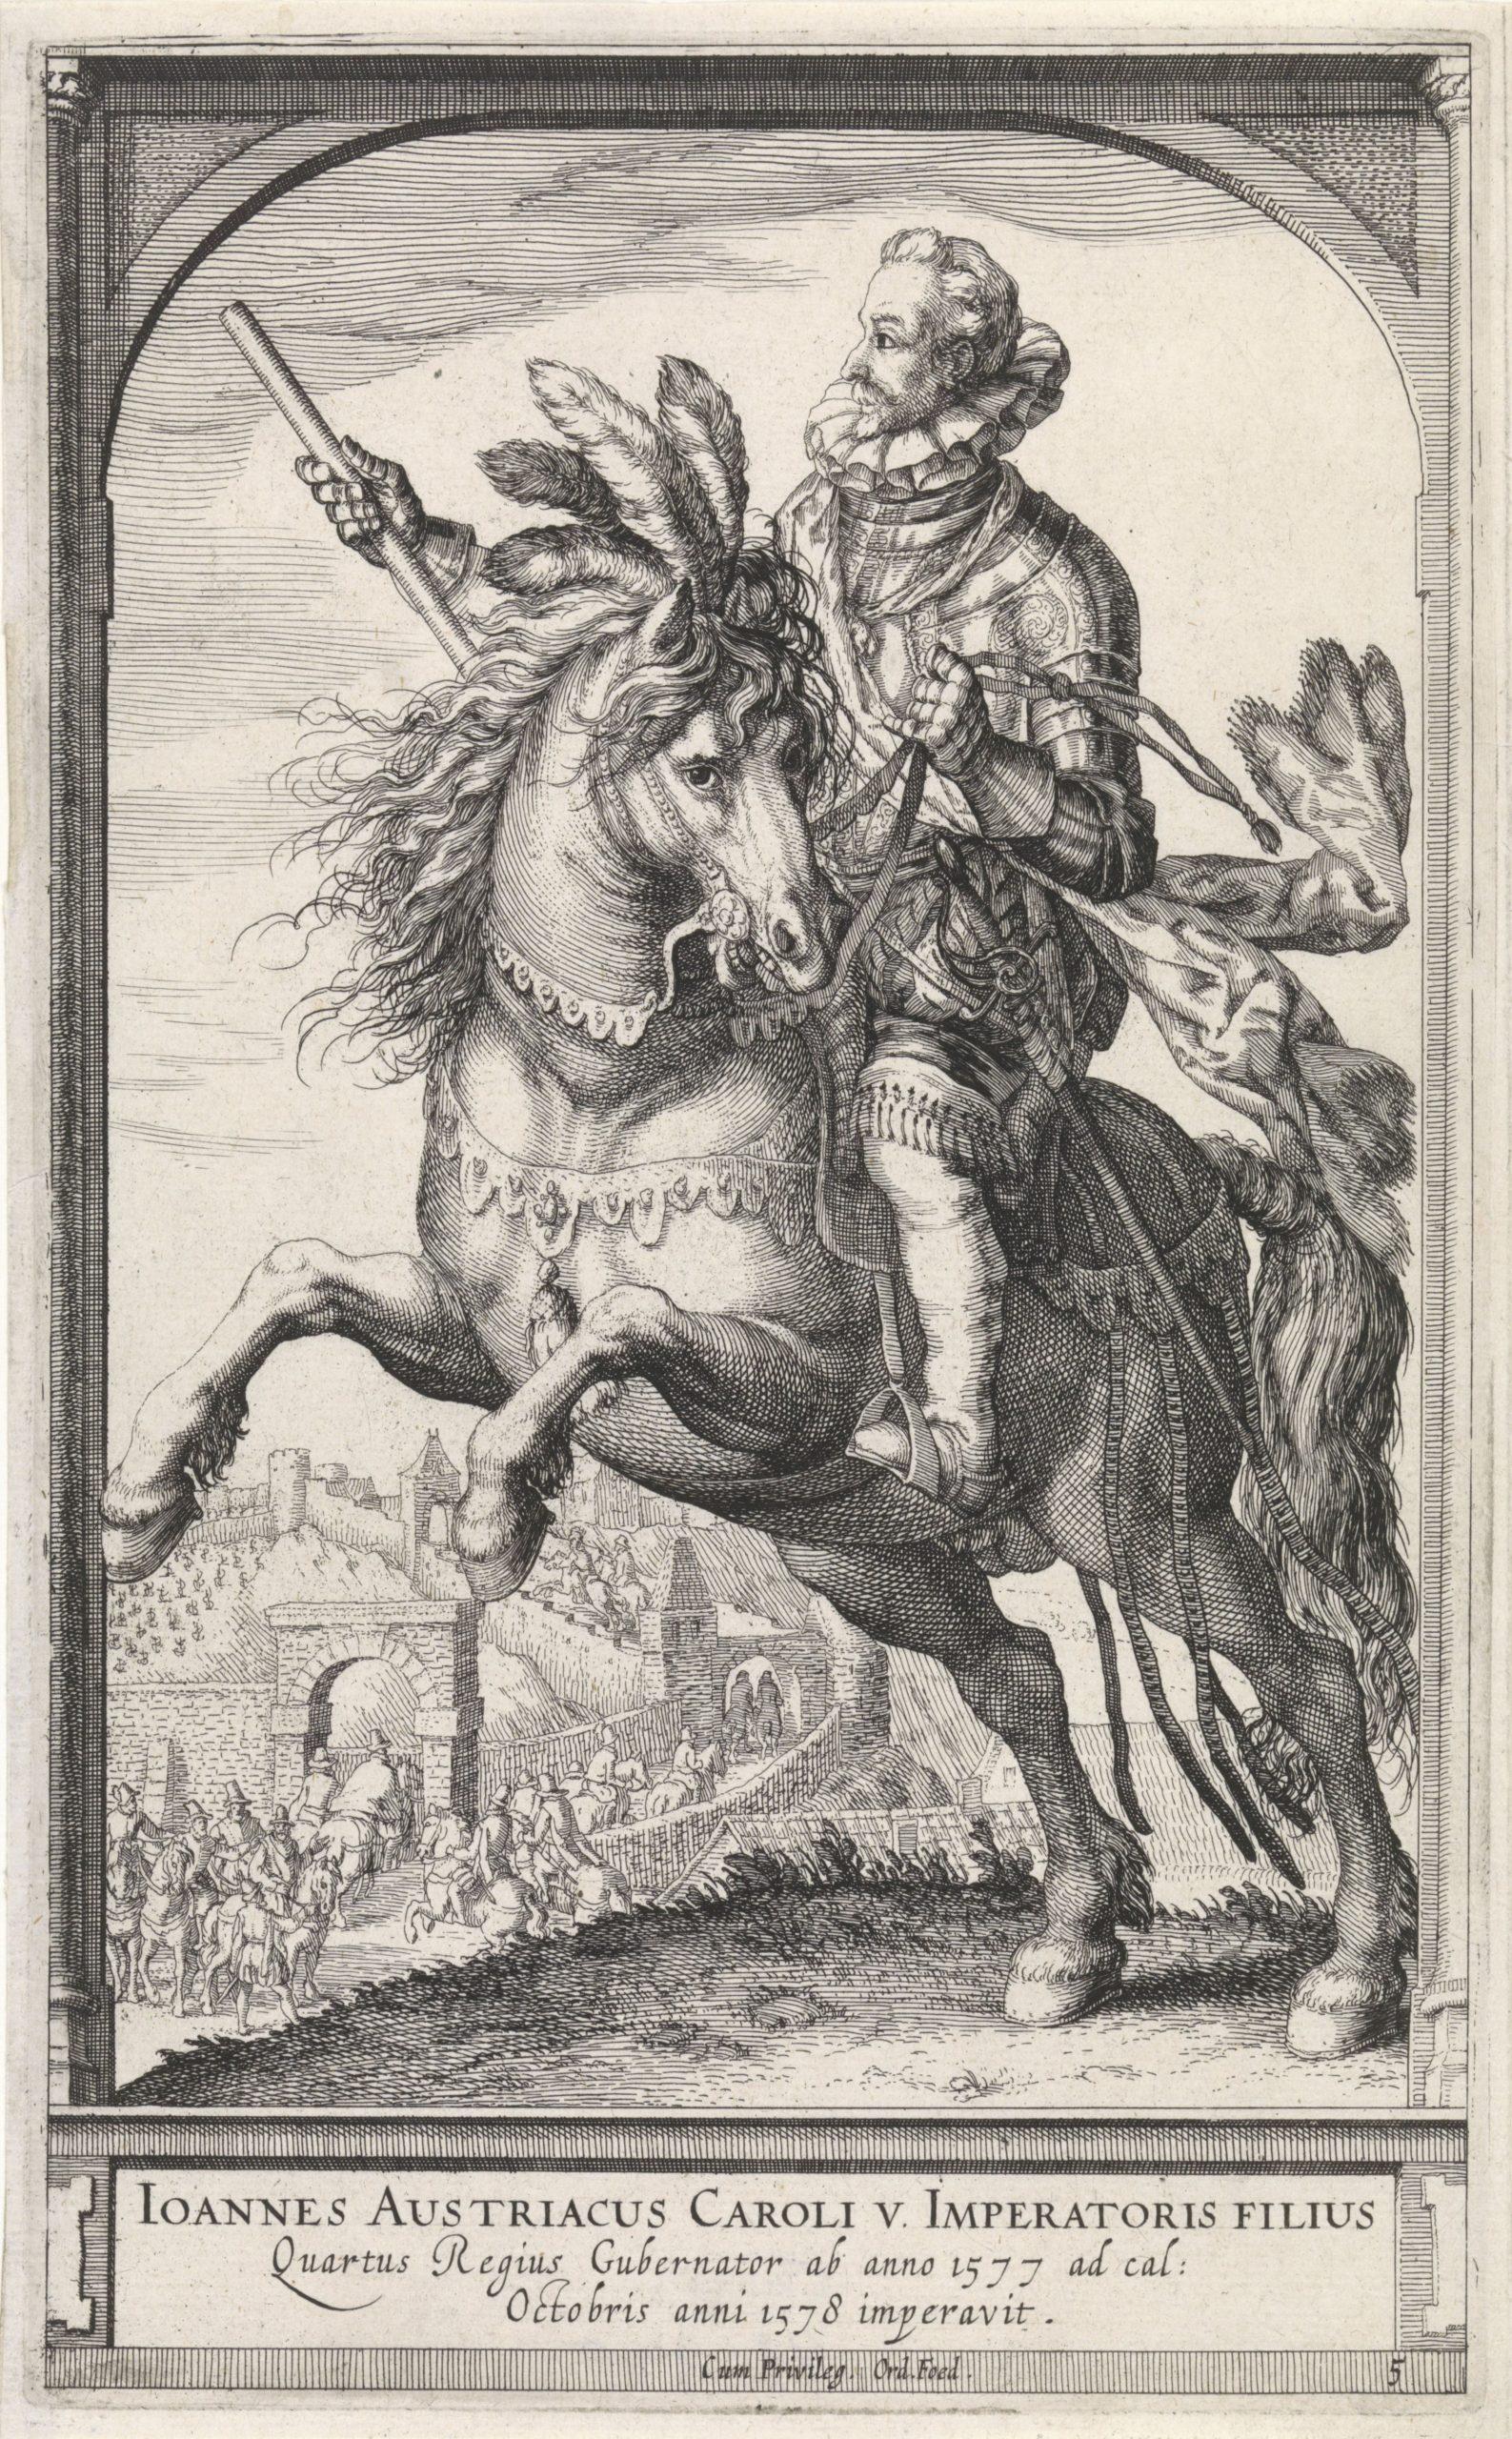 John of Austria, 1591 - 1632, Hessel Gerritsz, Amsterdam, Netherlands